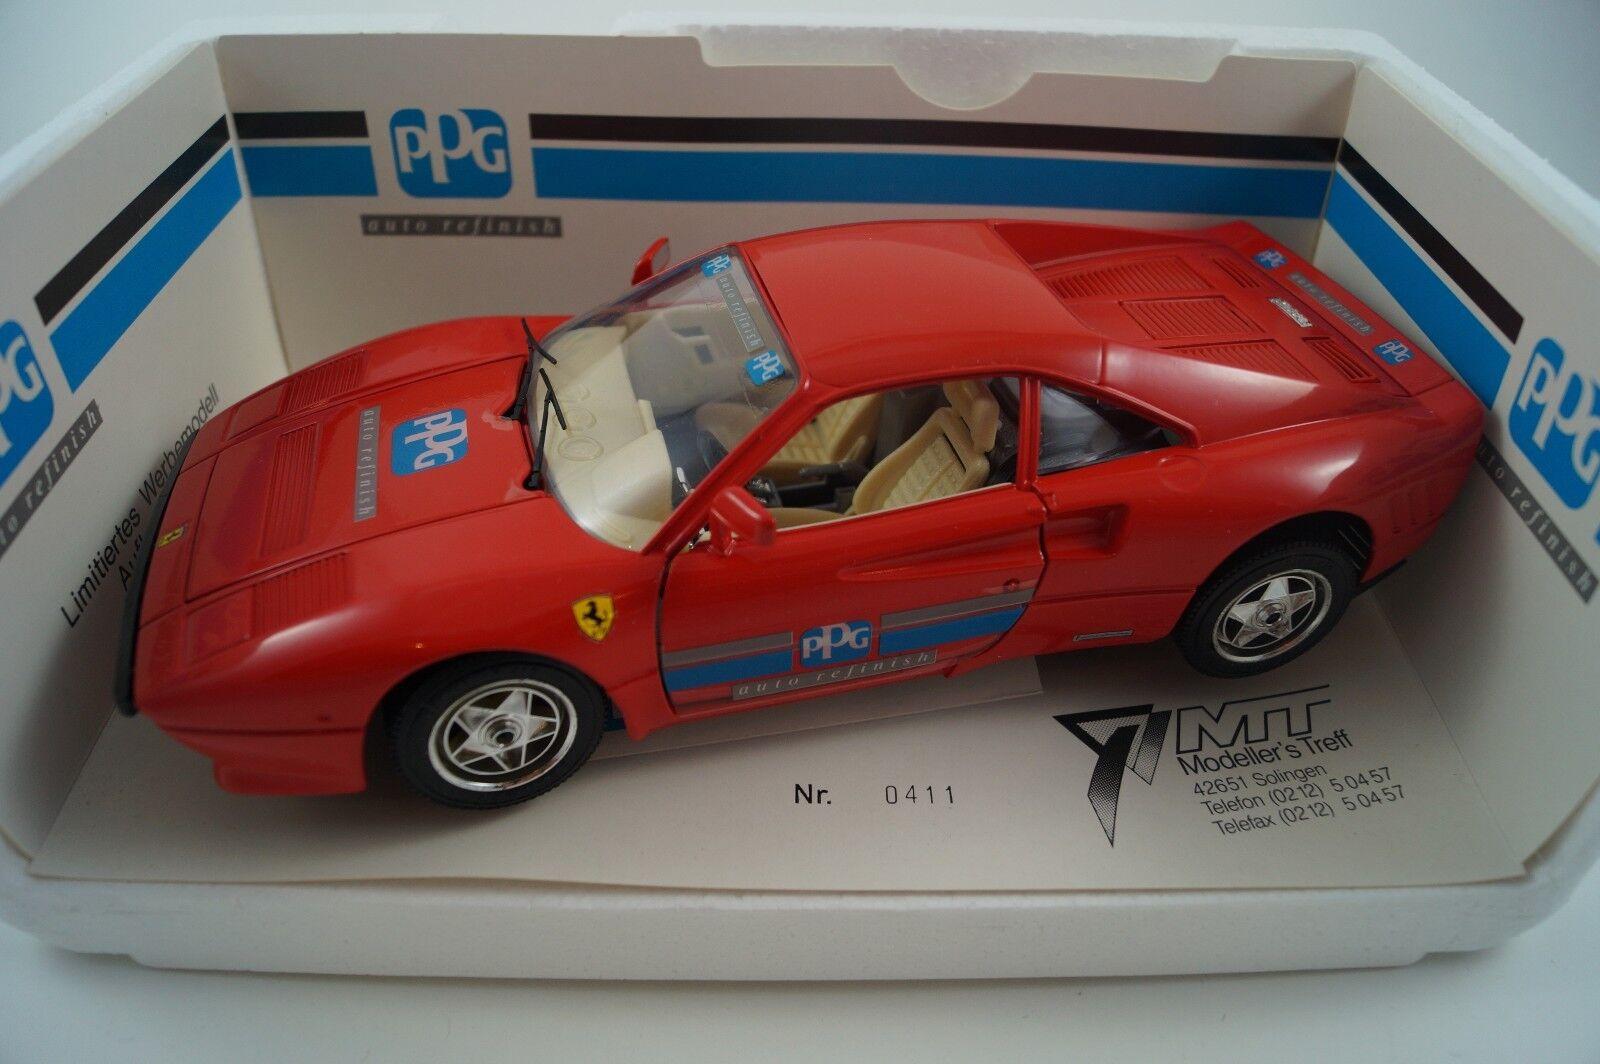 BBURAGO BURAGO voiture miniature 1 18 Ferrari GTO édition limitée 1000 pièces neuf dans sa boîte